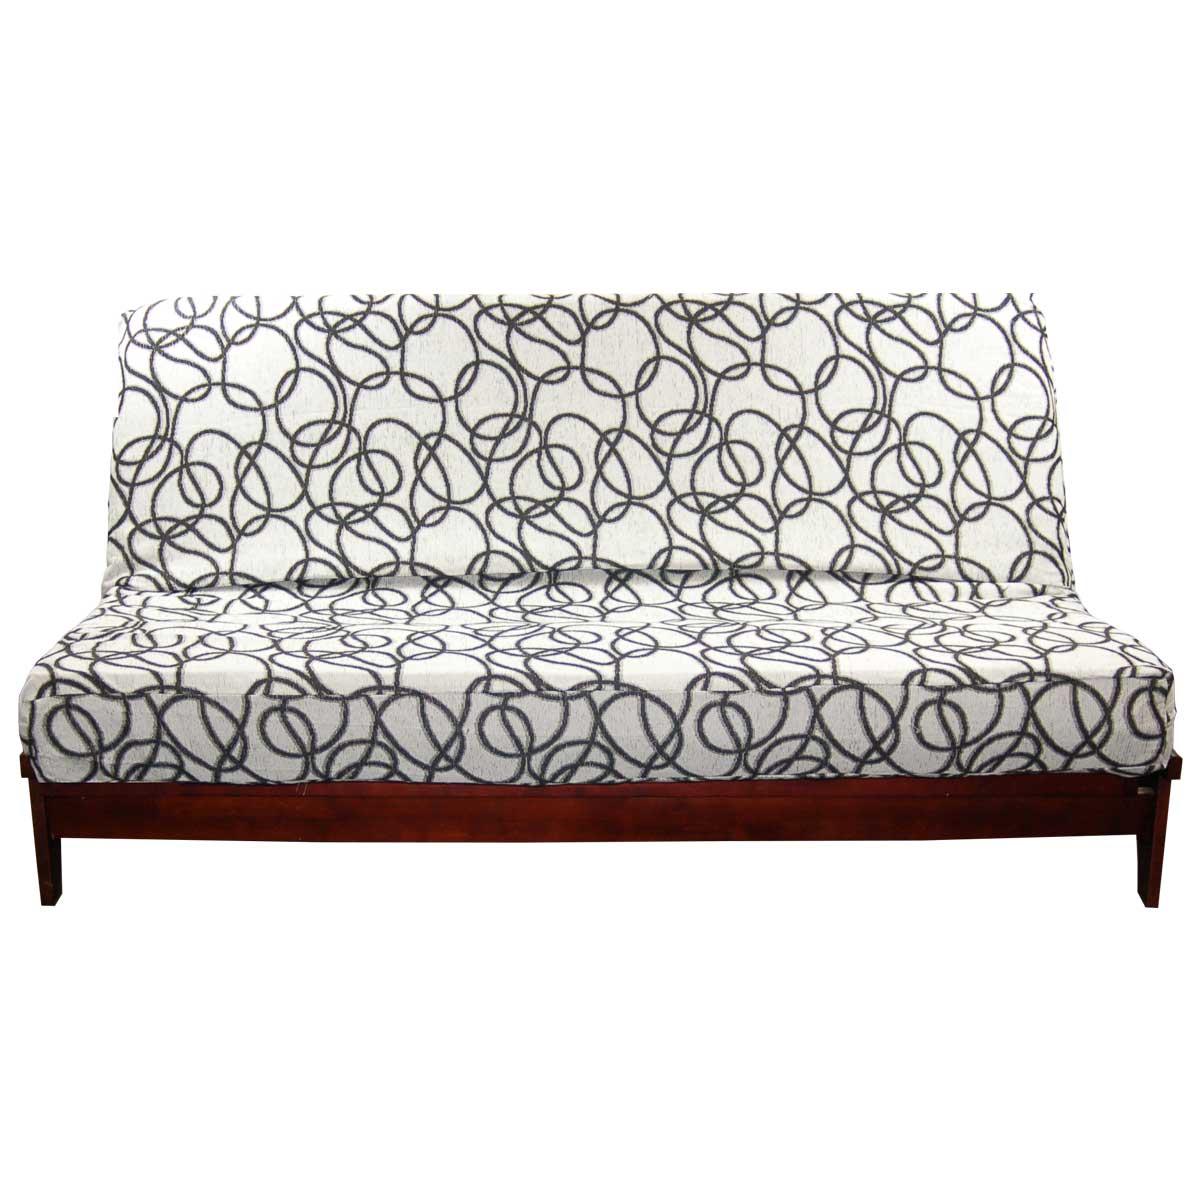 Brilliant Premium Heavy Texture S1 Futon Cover Full Alphanode Cool Chair Designs And Ideas Alphanodeonline